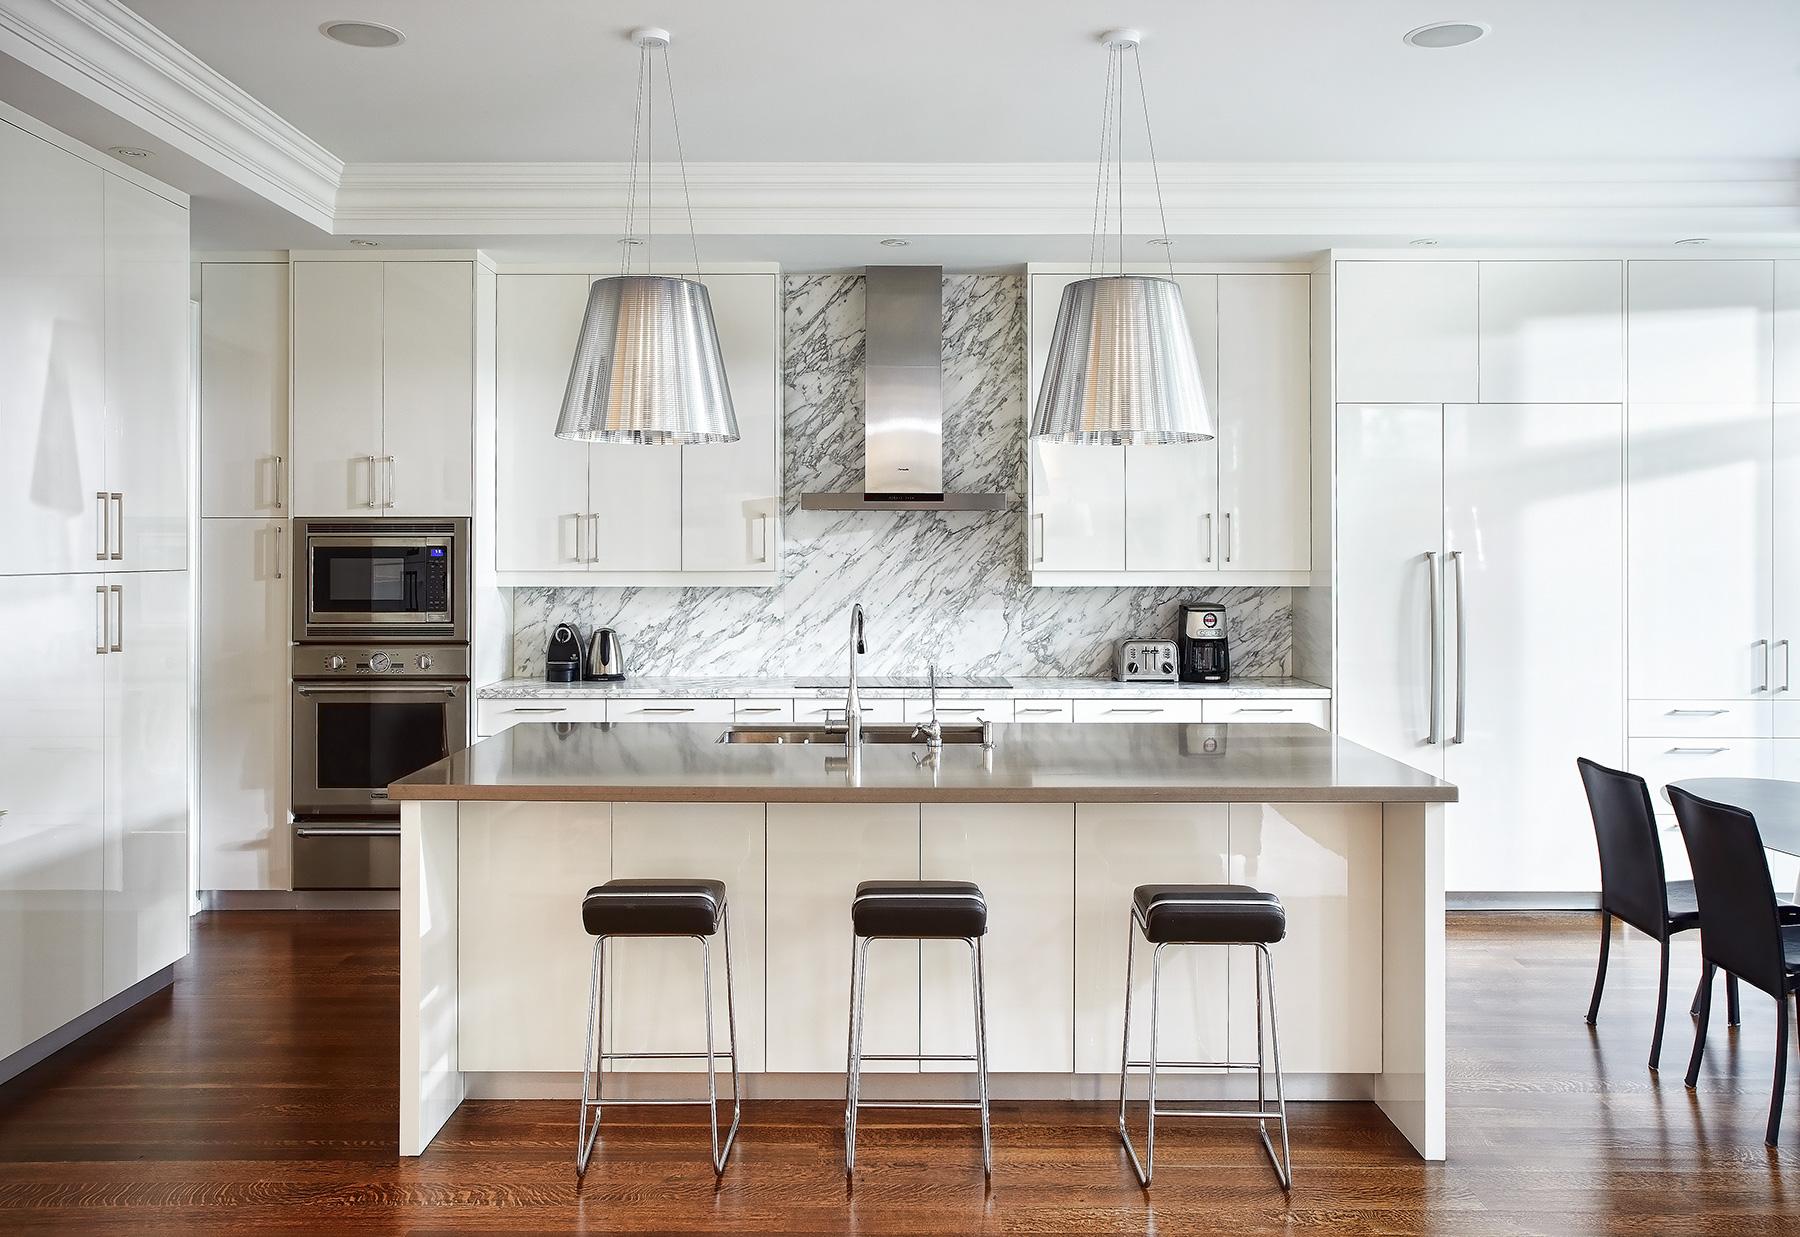 Architectural-Interior-john-trigiani-Kitchen-toronto-photographer